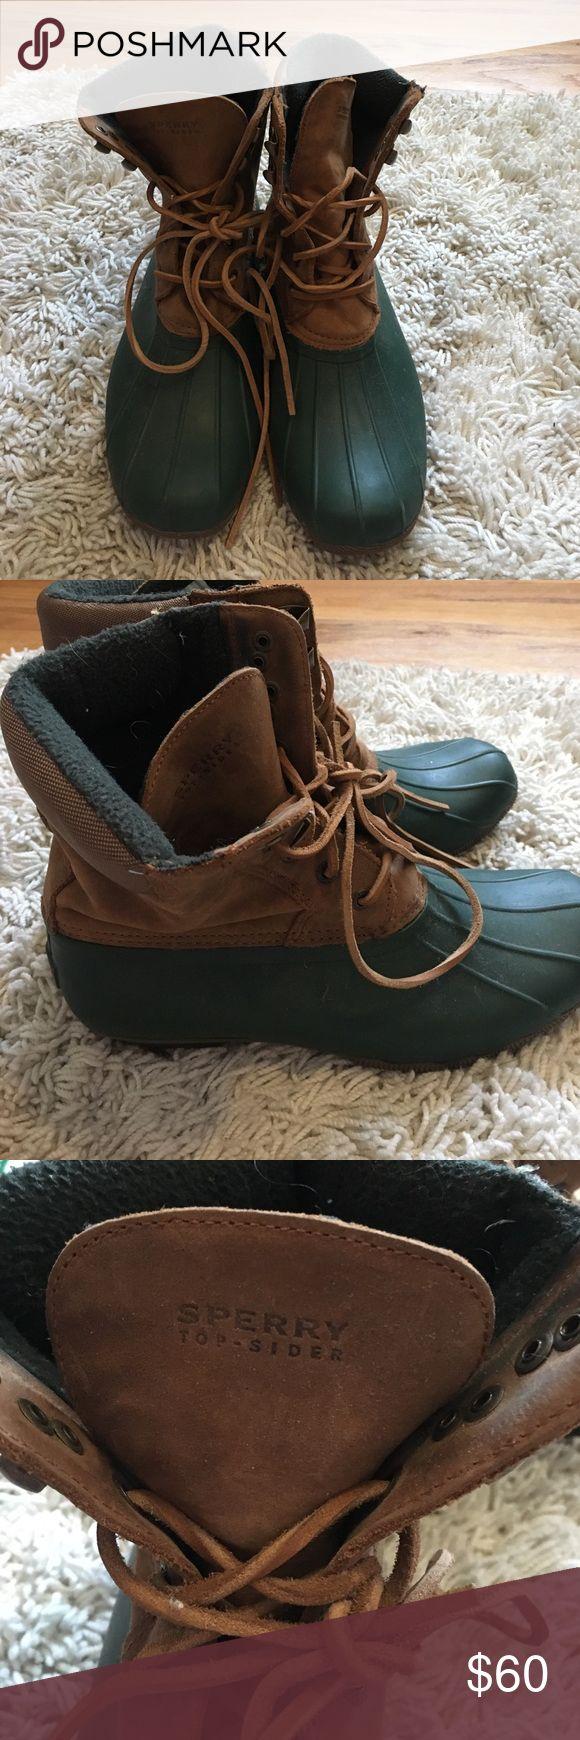 Sperry winter boots Green/brown Sperry winter boots Sperry Top-Sider Shoes Winter & Rain Boots